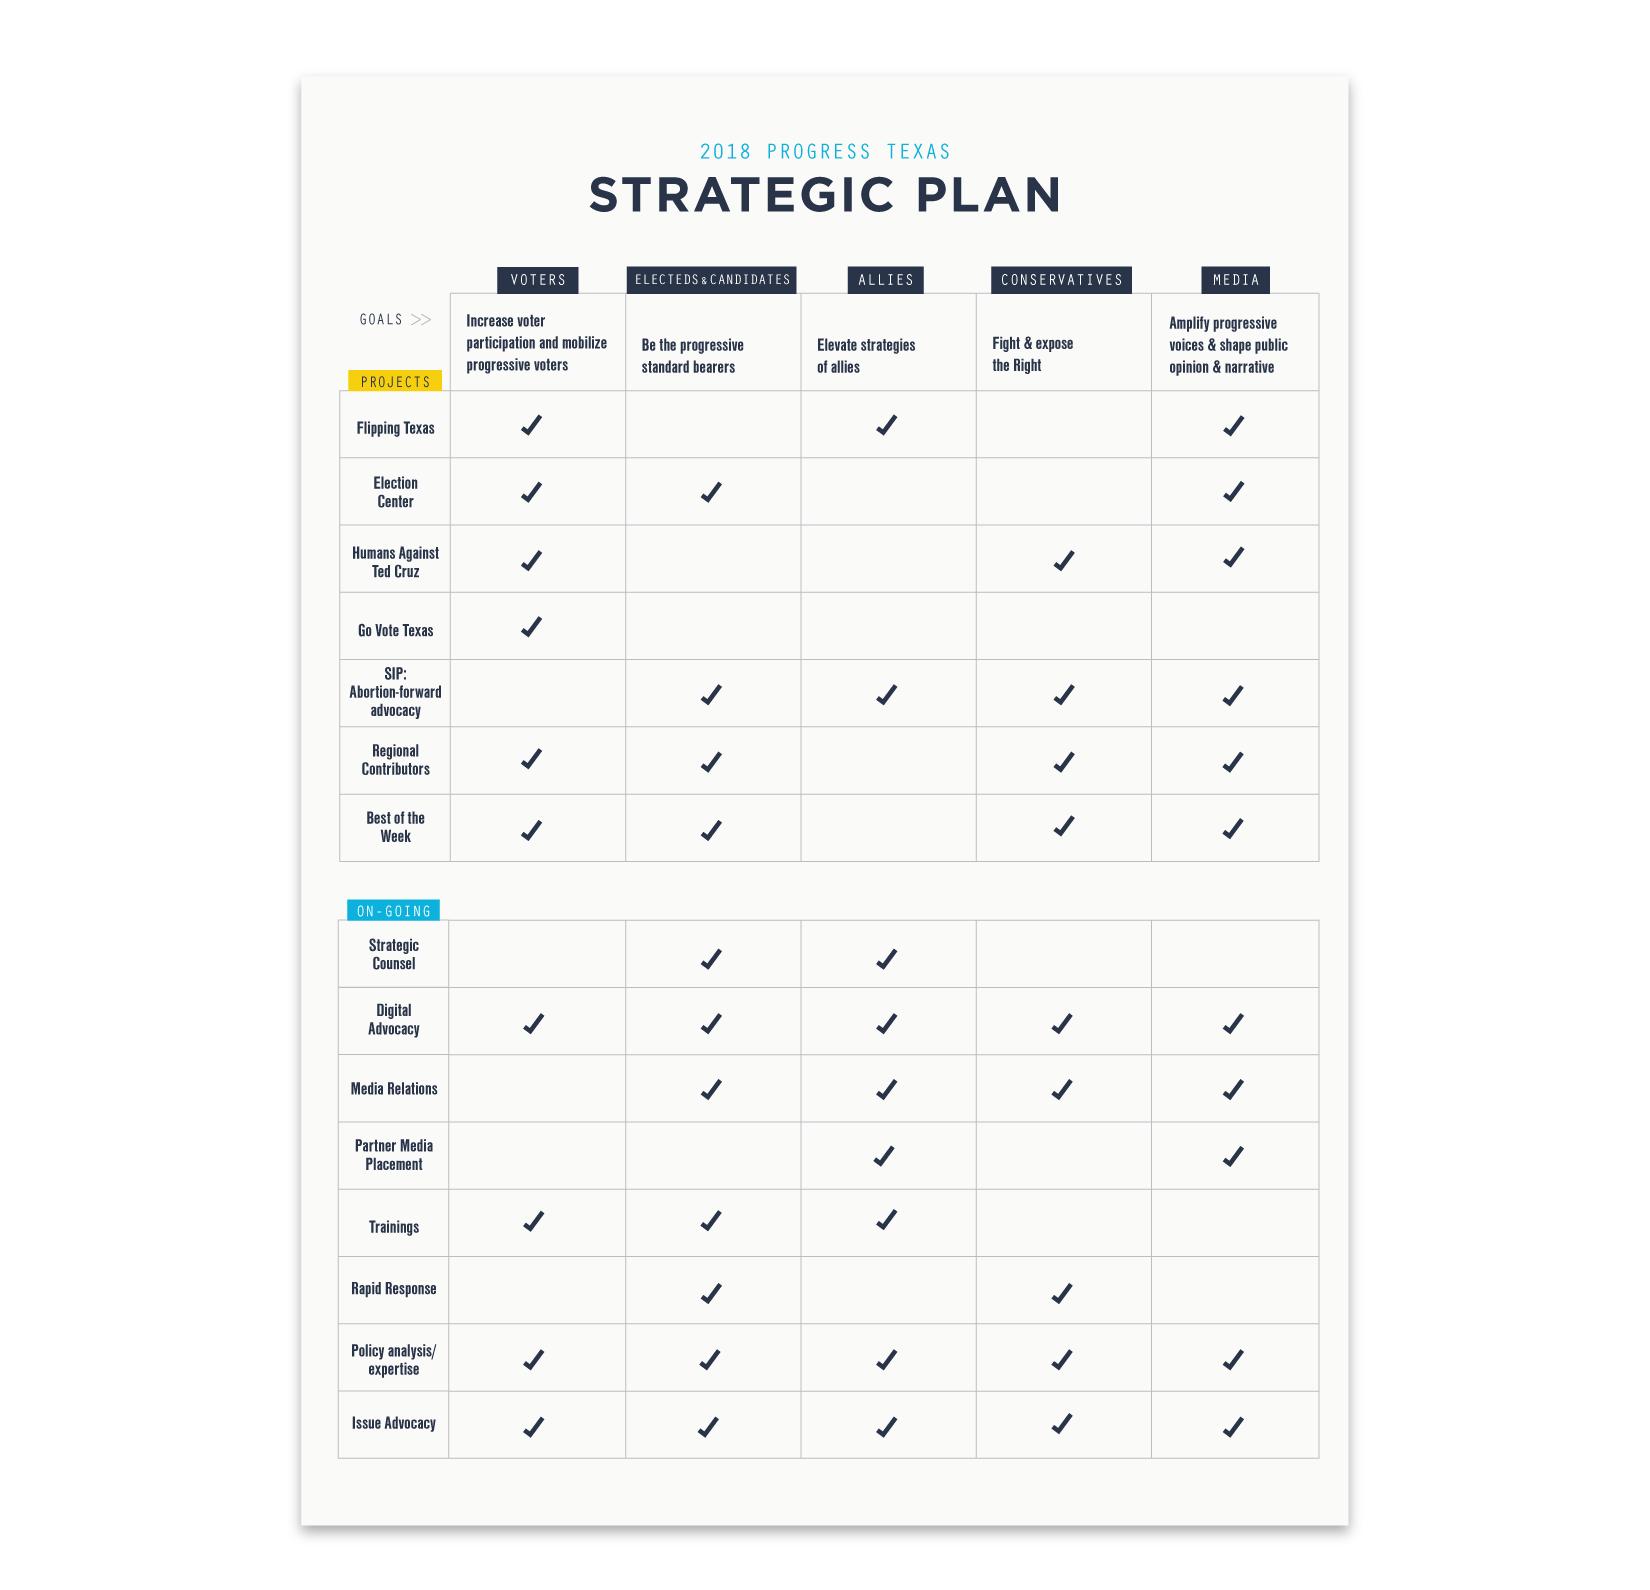 strategicplan.png